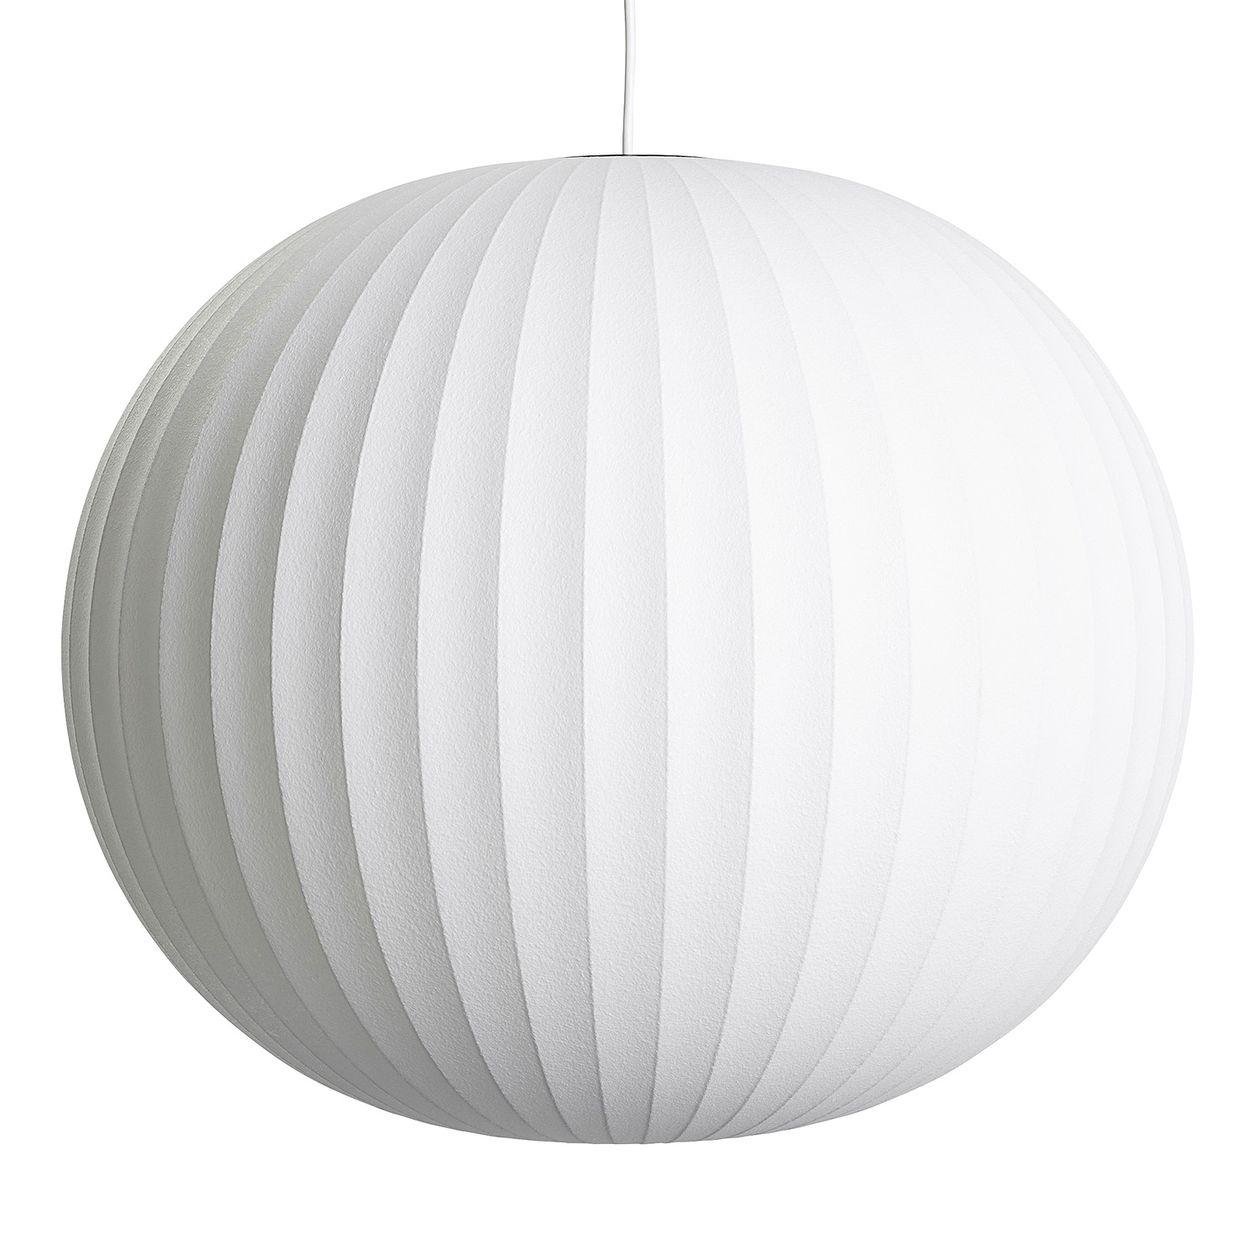 Hay Nelson Ball Bubble pendant